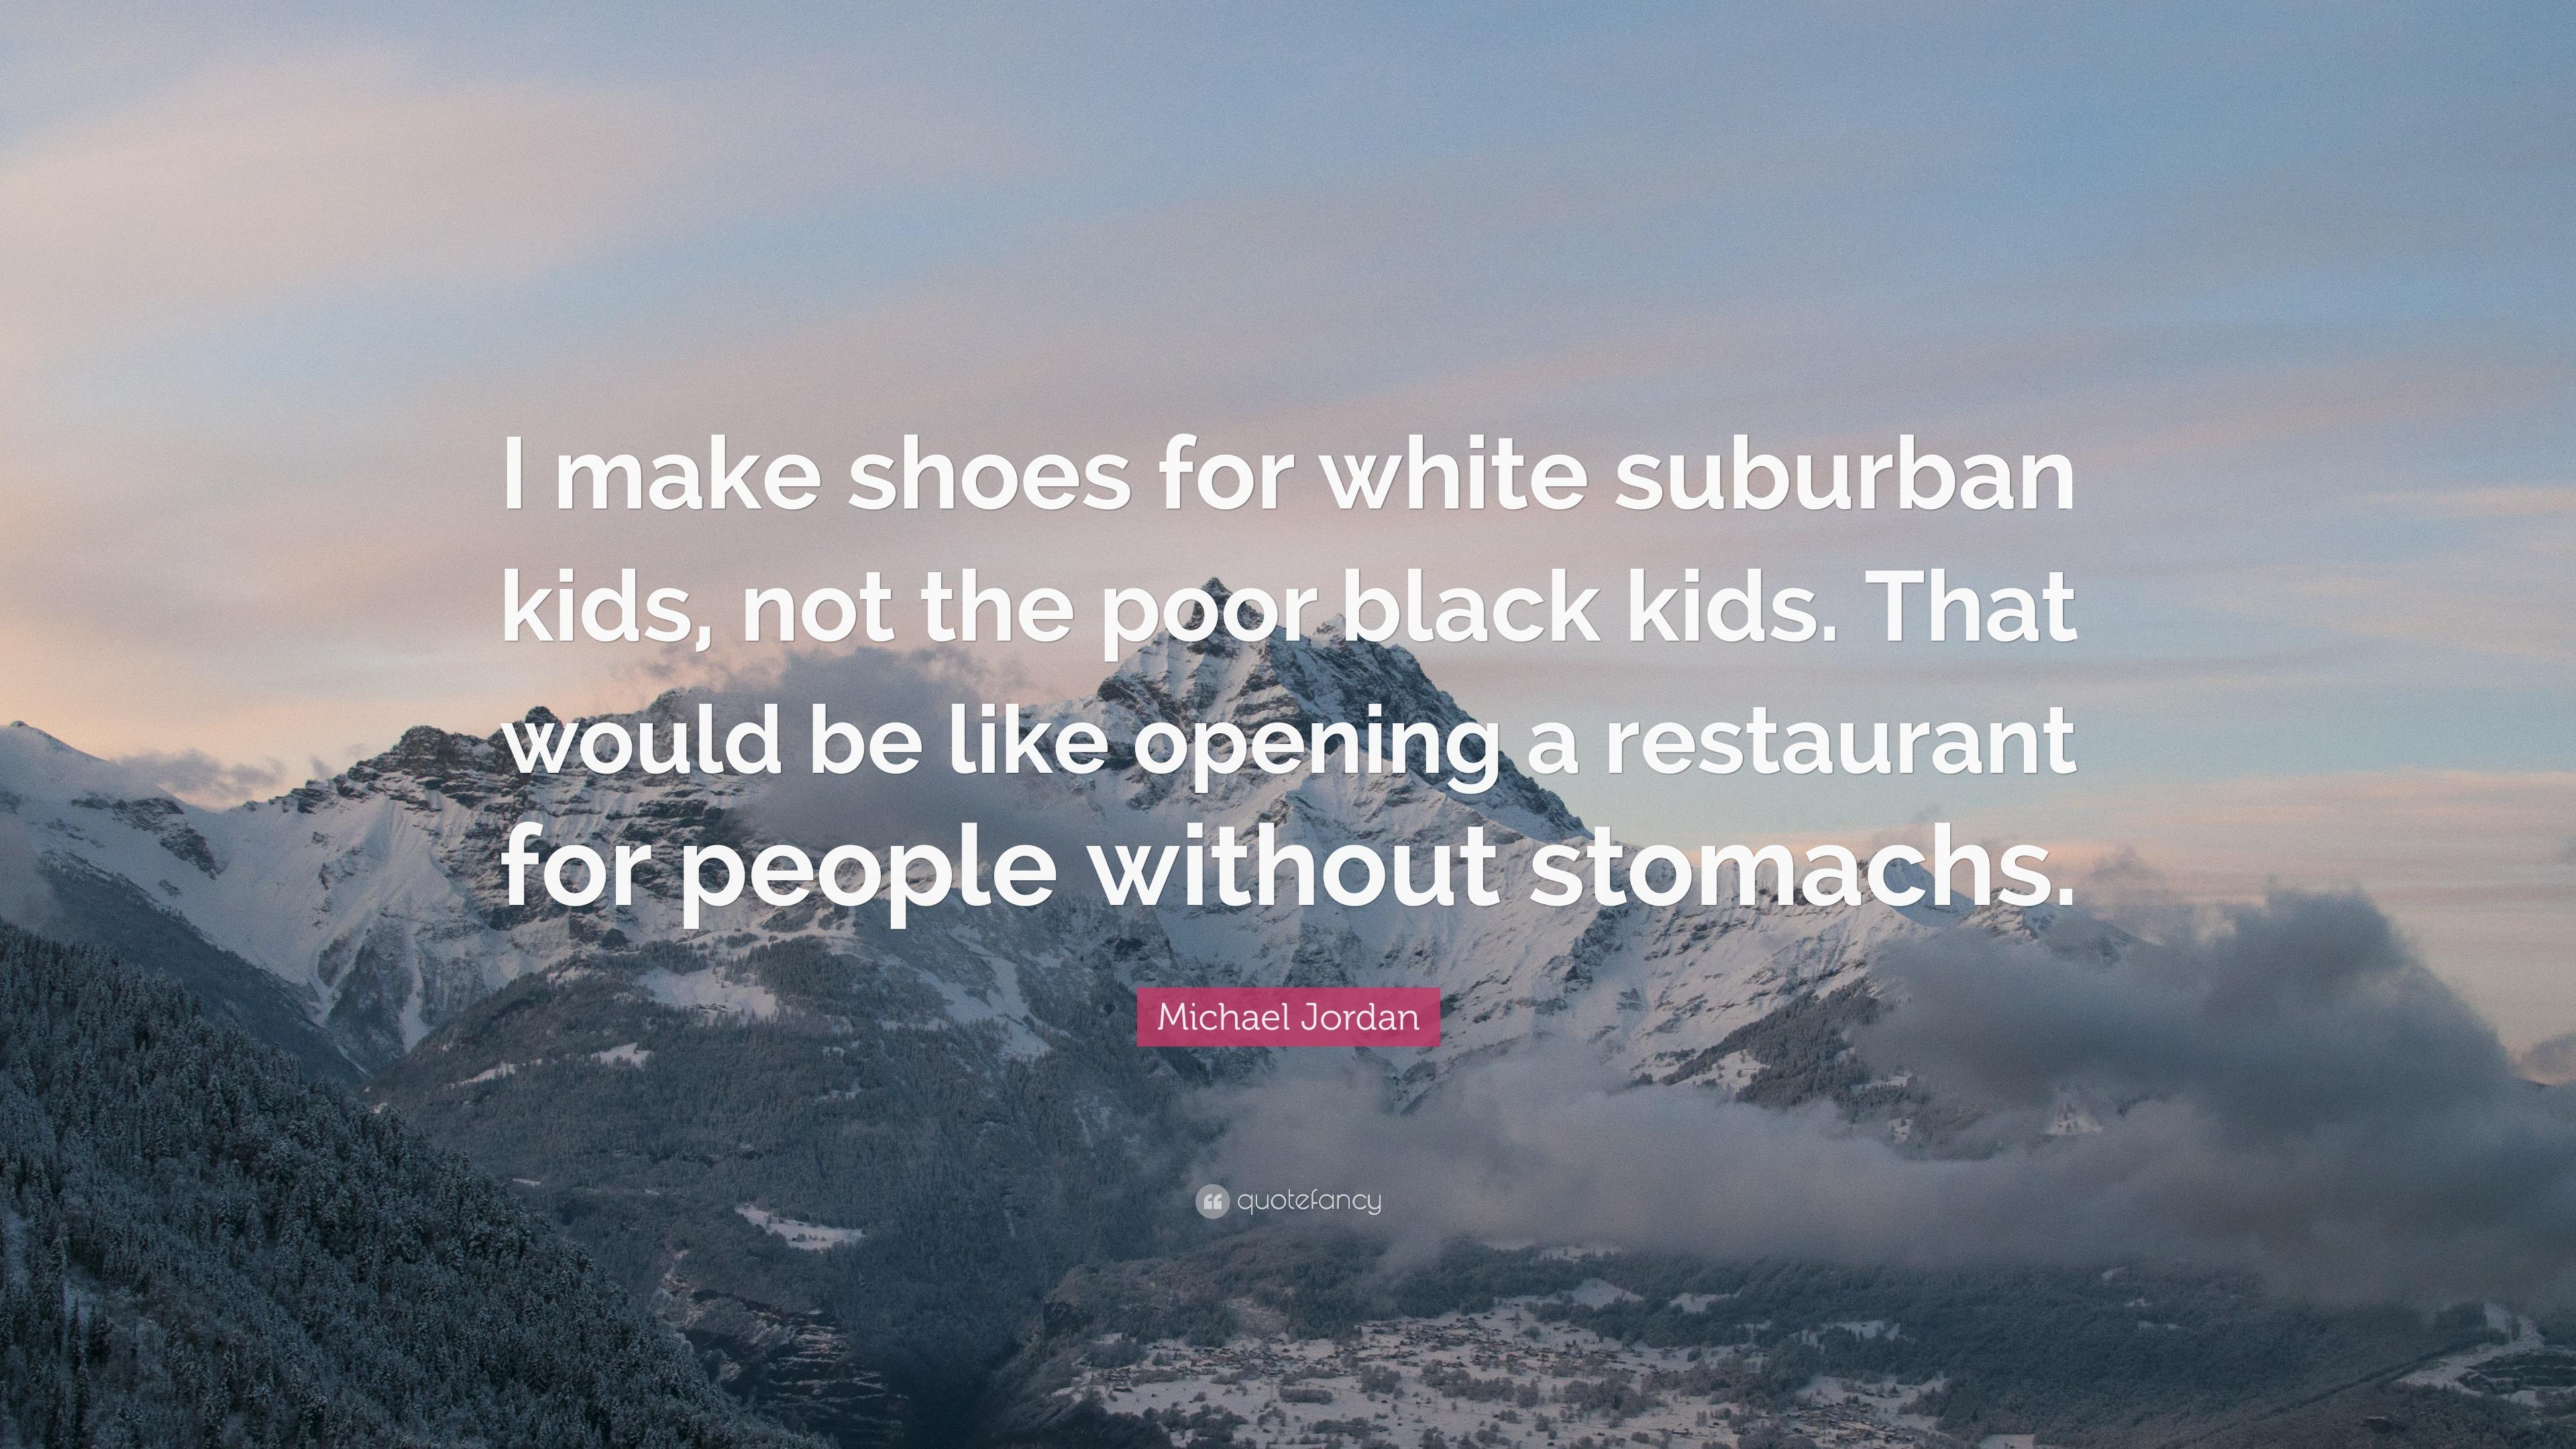 Jordan Shoes For White Suburban